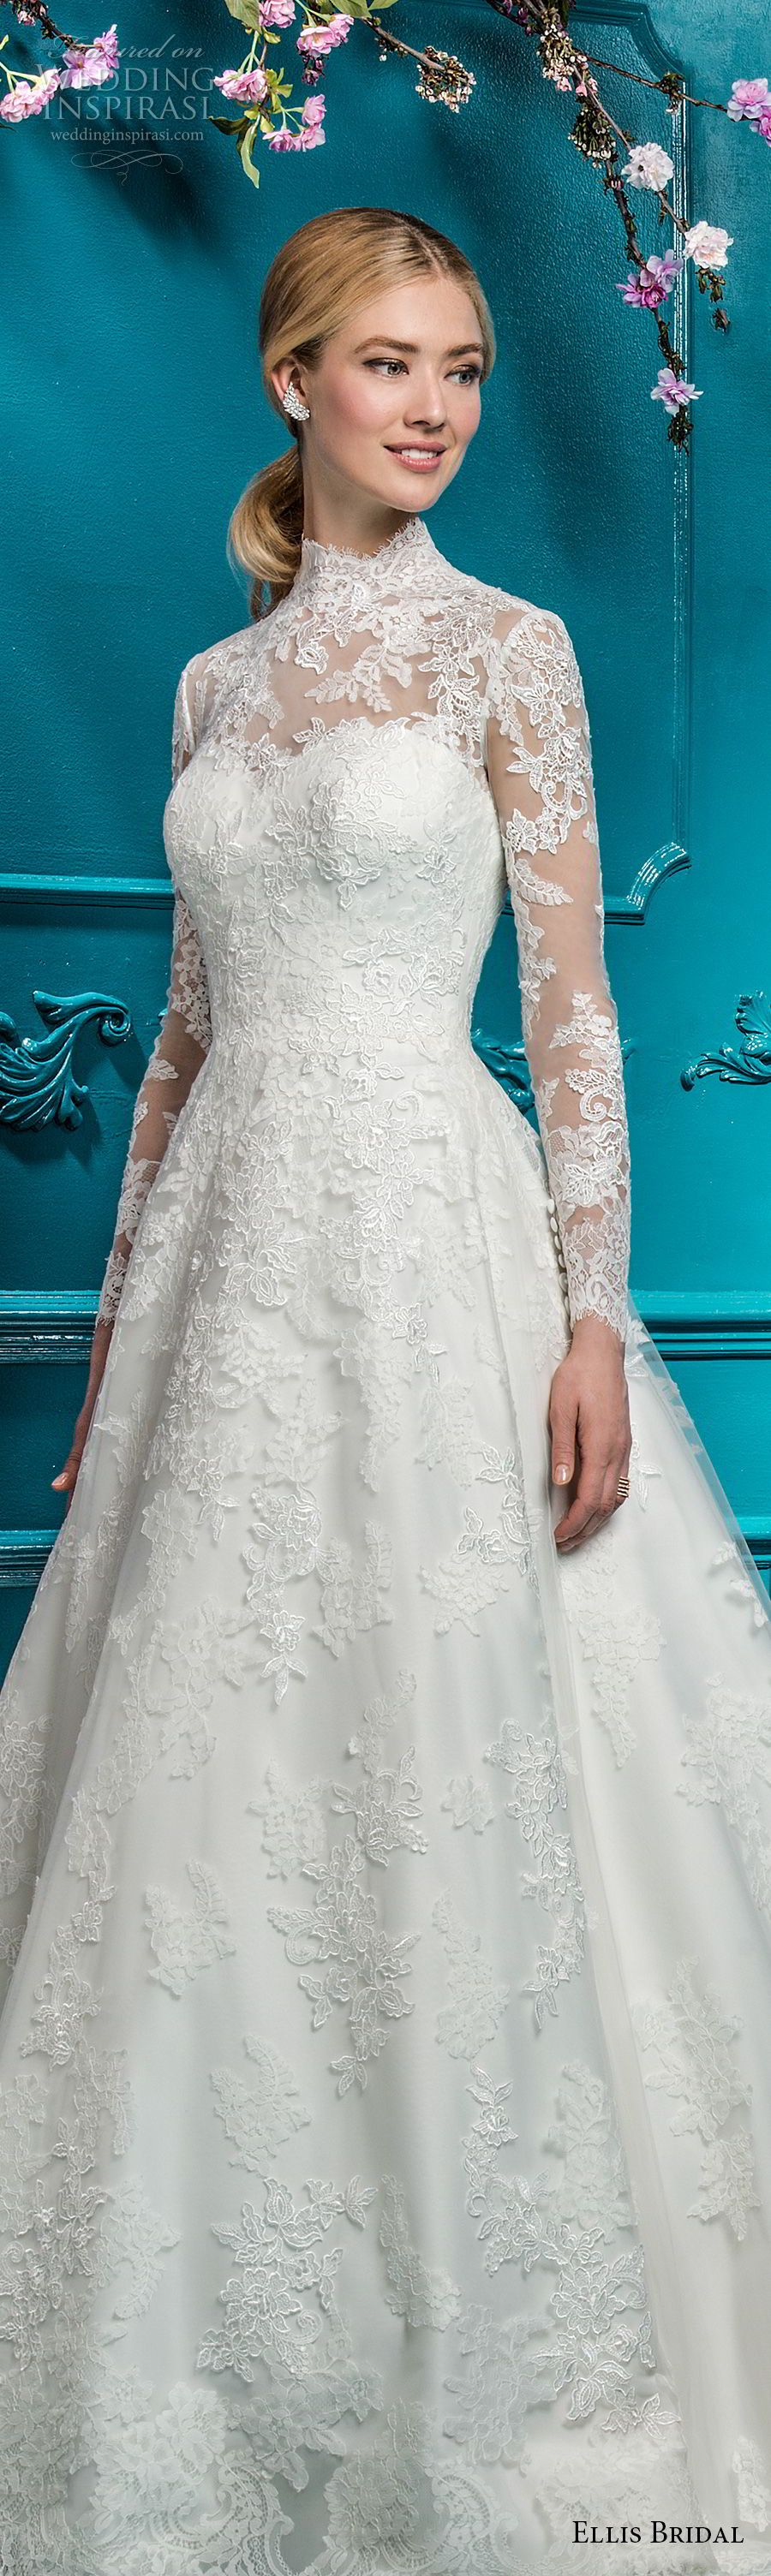 Ellis Bridals 2018 Wedding Dresses Dusk Bridal Collection Inspirasi